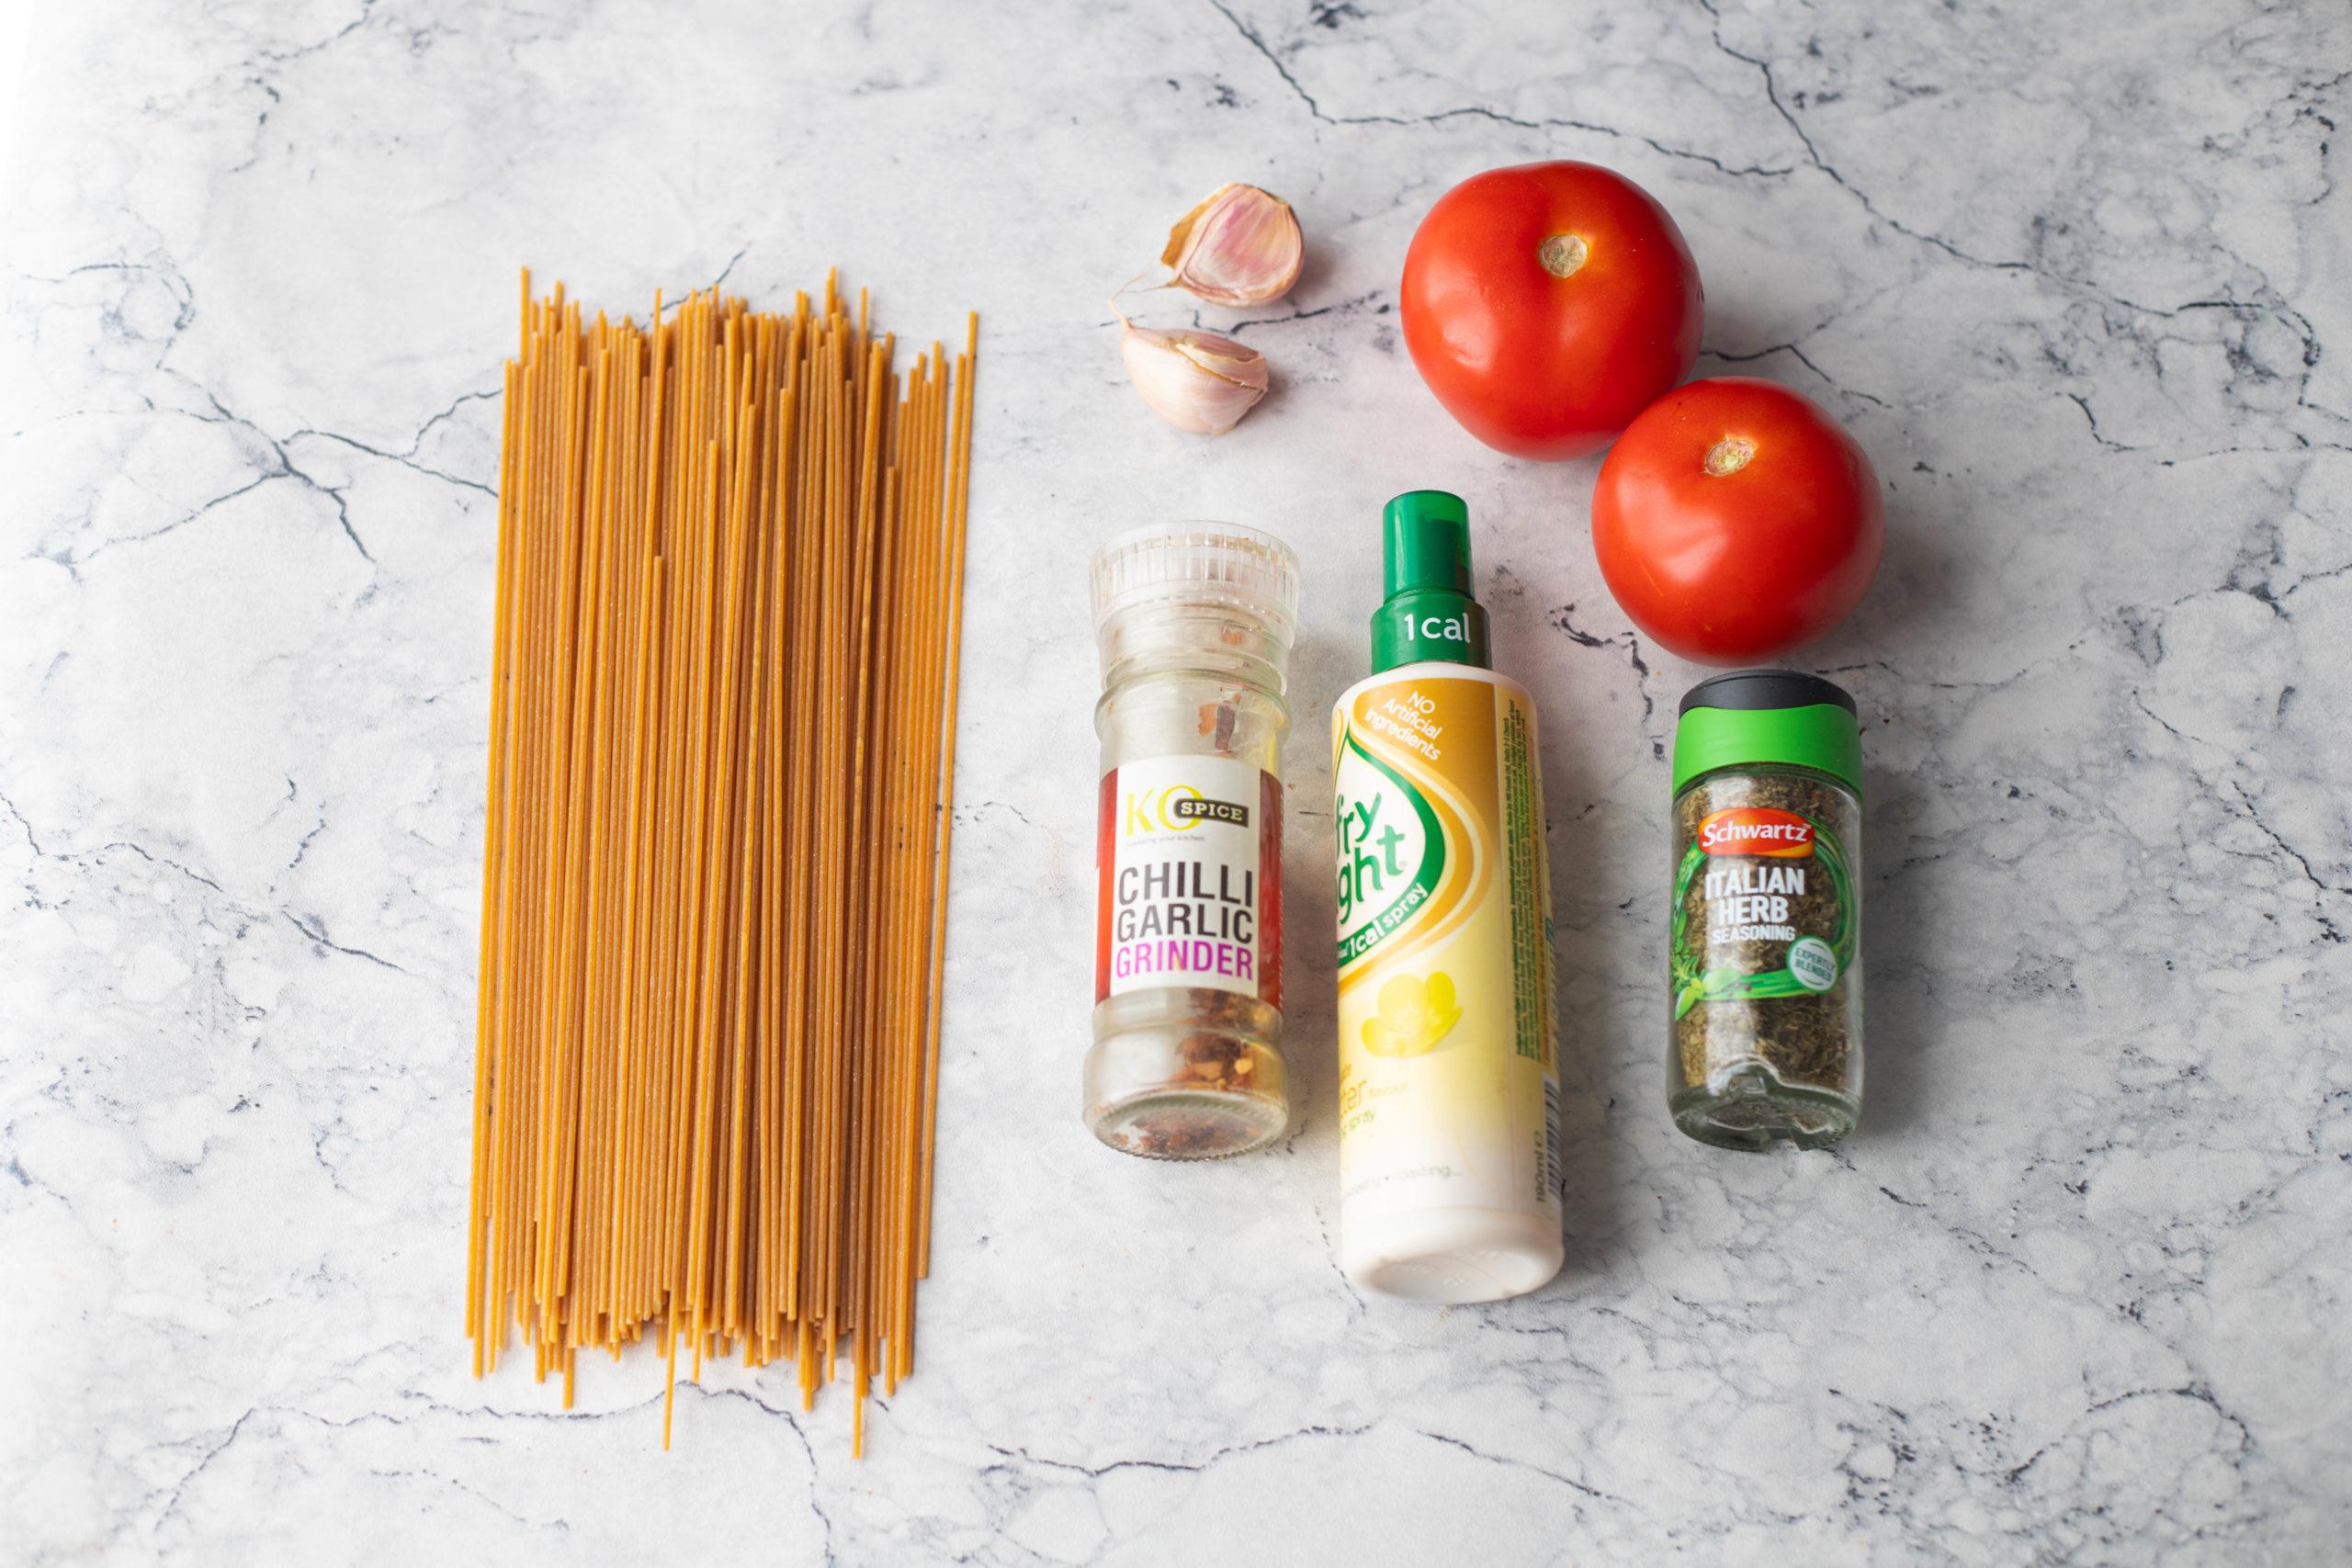 Ingredients for Roasted garlic tomato pasta